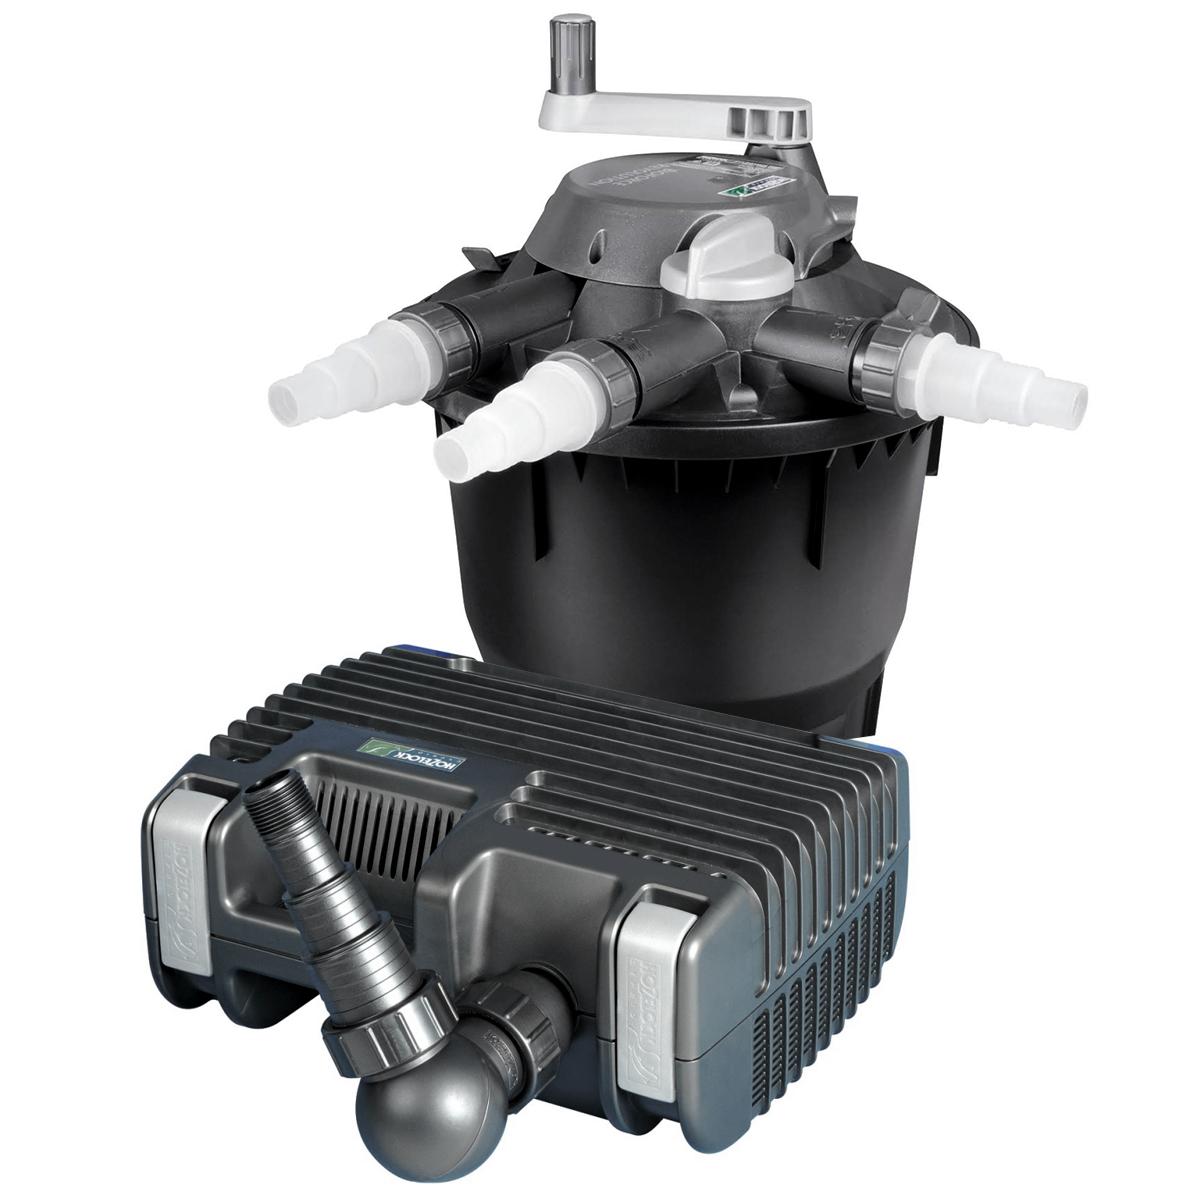 Hozelock bioforce revolution 6000 uv pond pressure filter for Hozelock pond pumps and filters